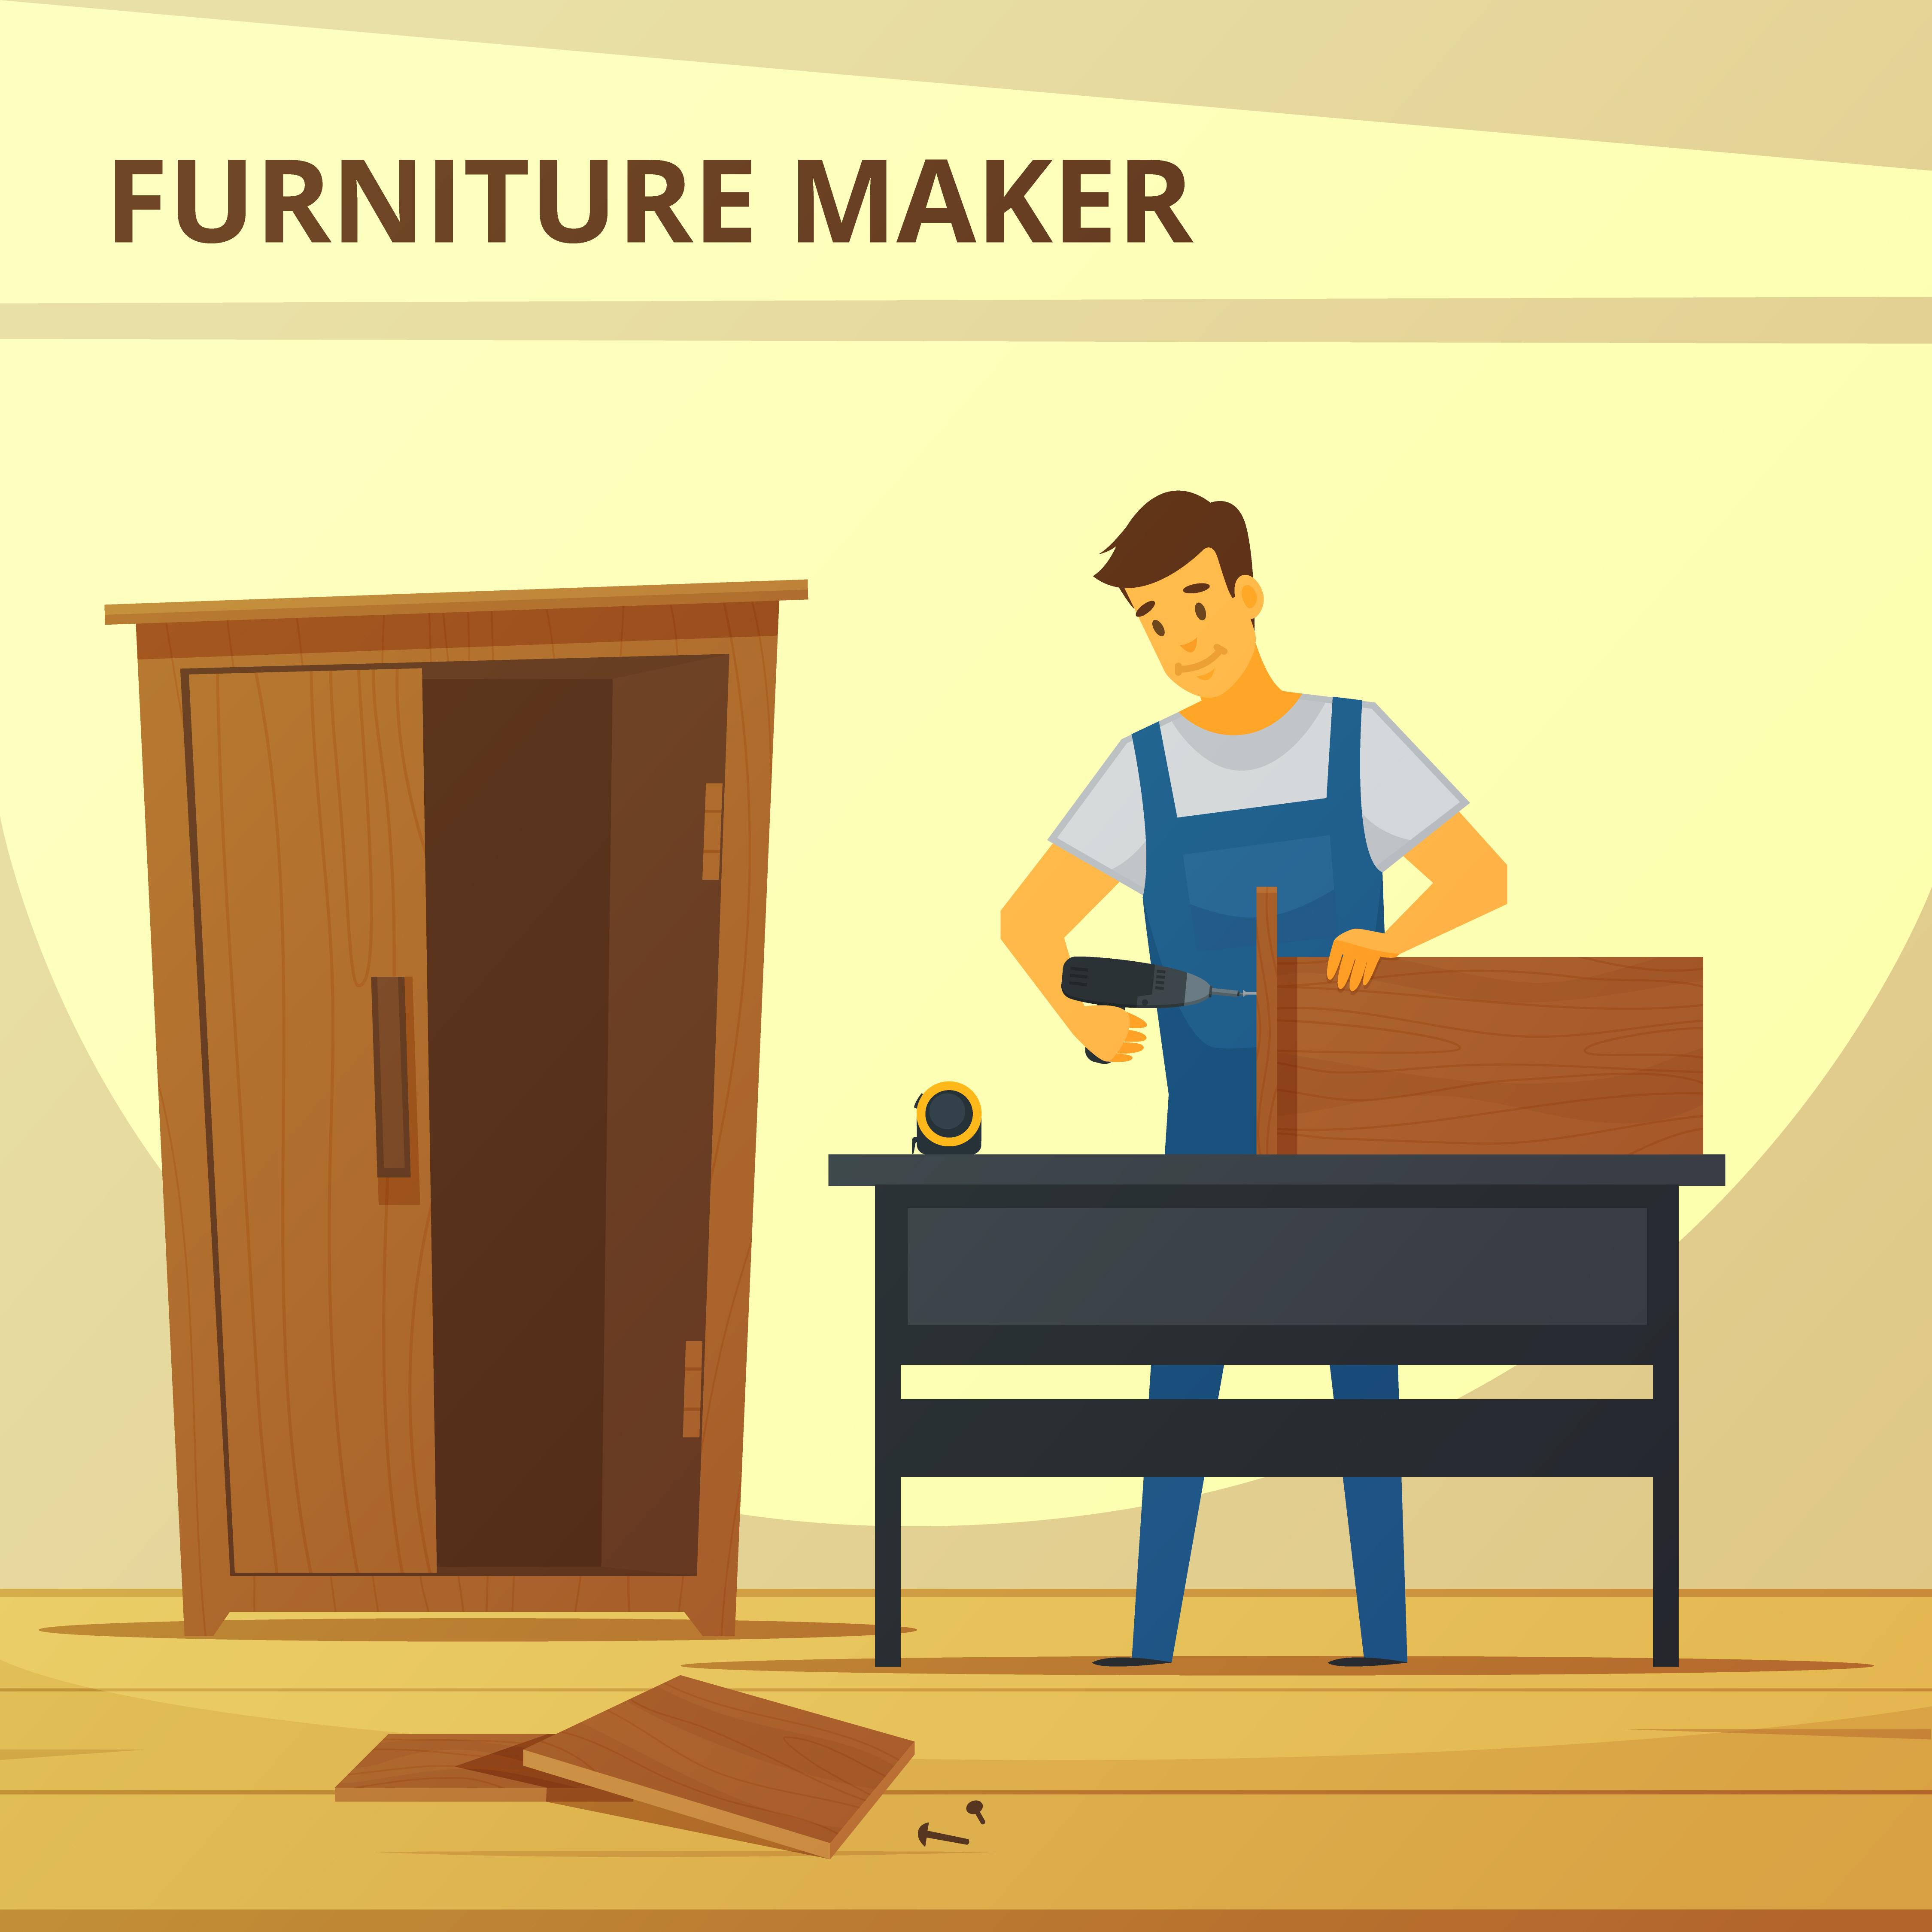 Cabinet Maker Clip Art: Carpenter Assembling Furniture Flat Poster